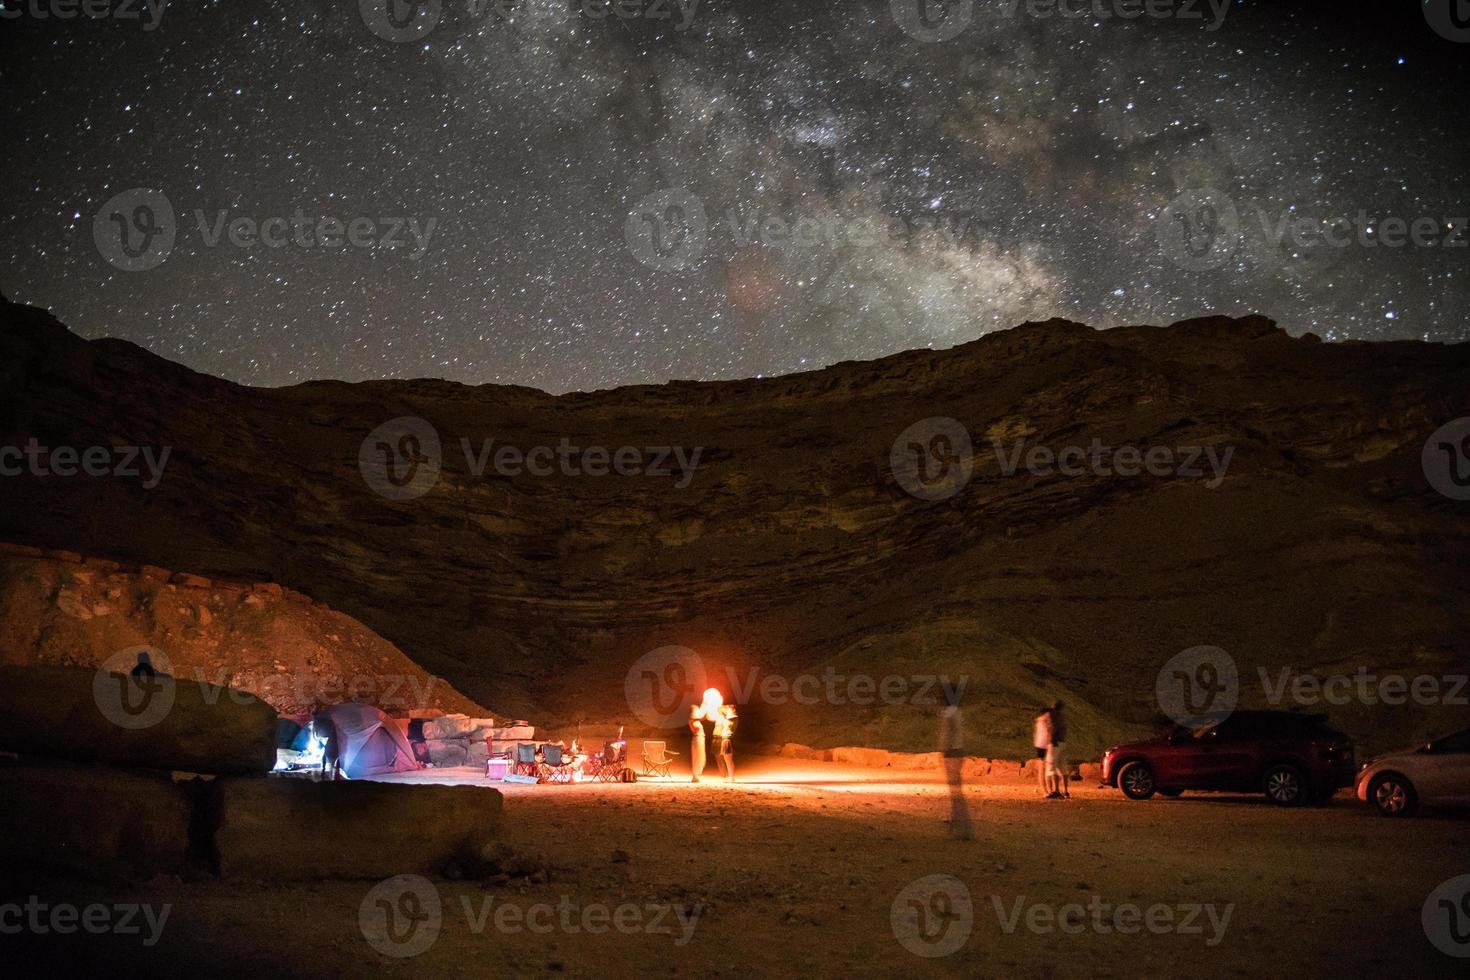 Night camping under stars photo